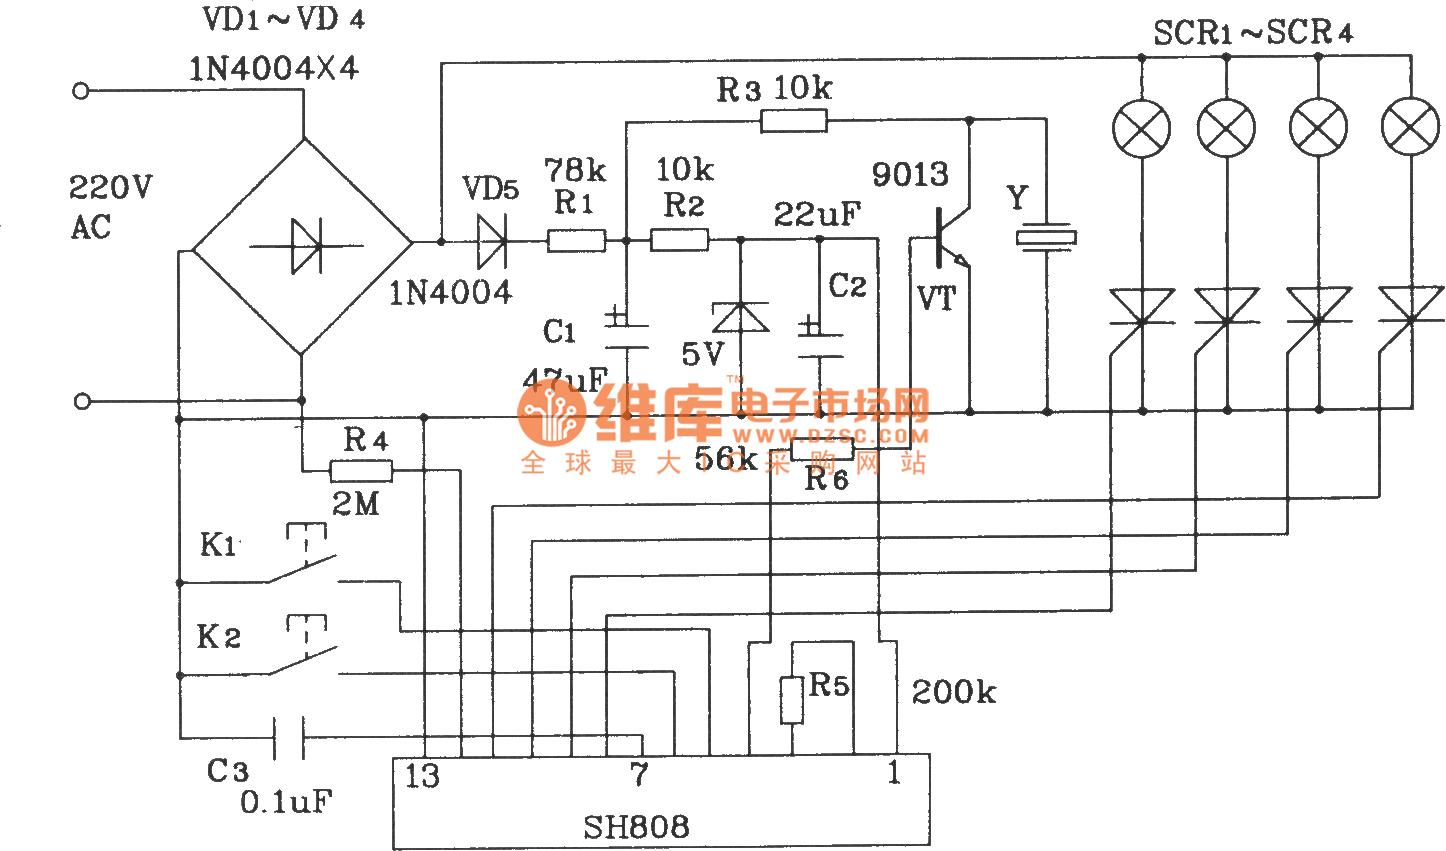 hight resolution of color lamp control circuit composed of sh808 multifunction music lampcontrol ledandlightcircuit circuit diagram seekiccom